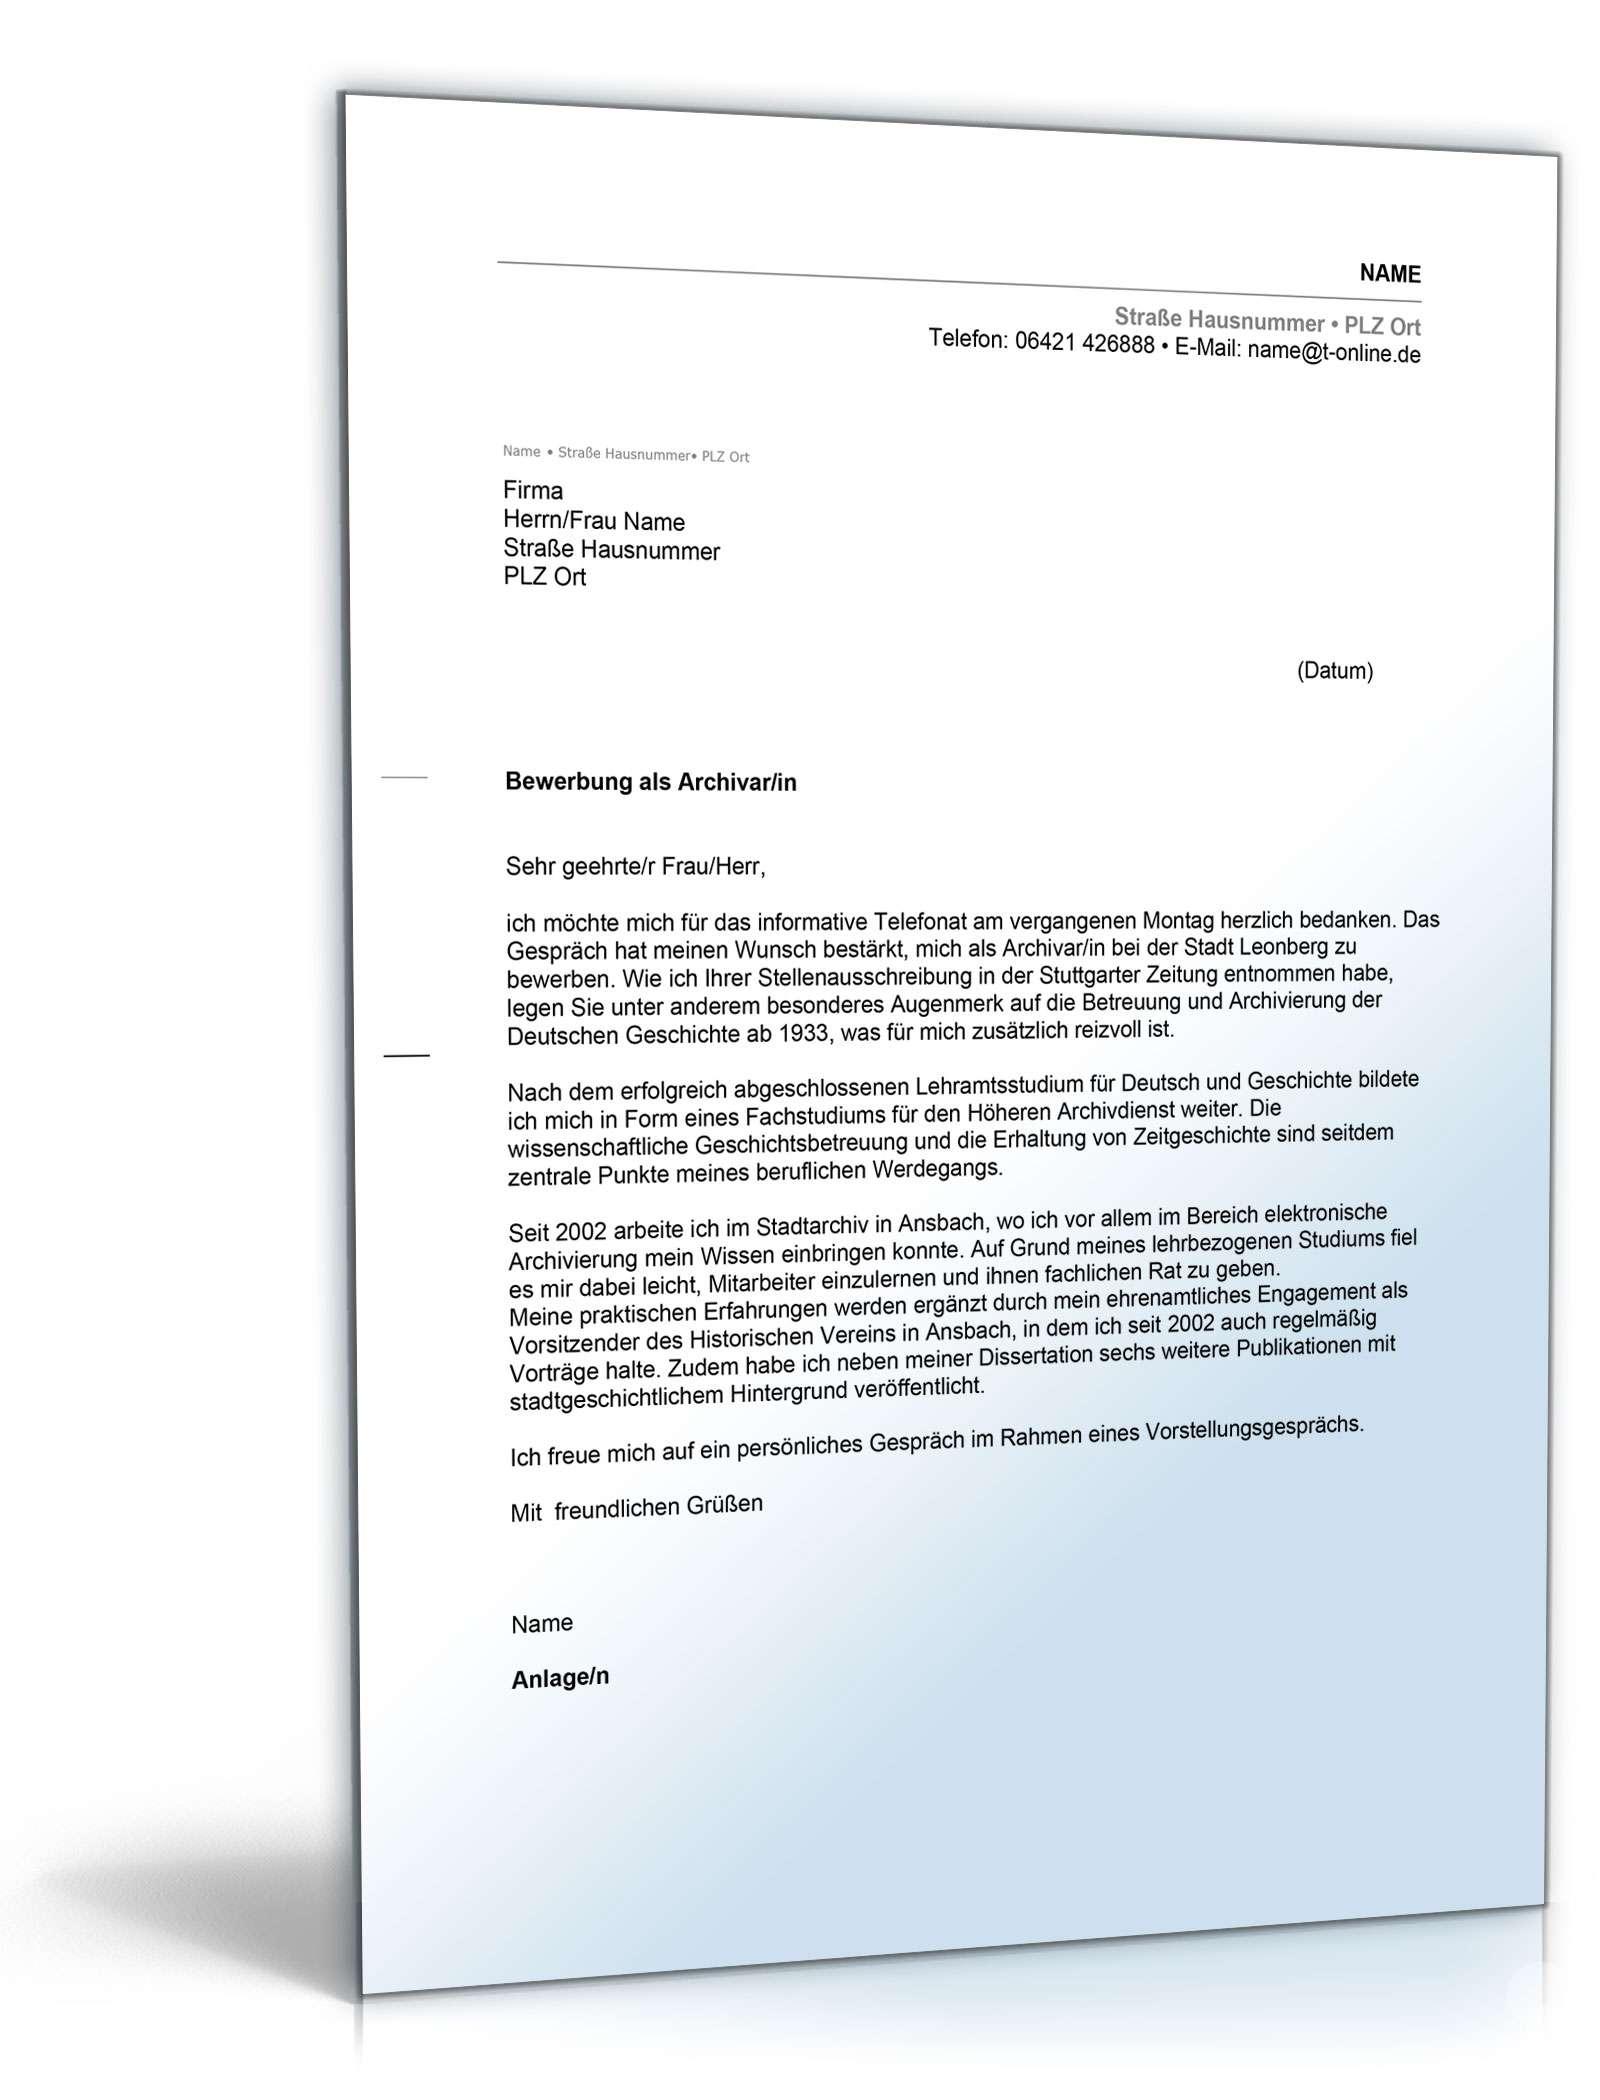 Anschreiben Bewerbung Archivar Muster Zum Download